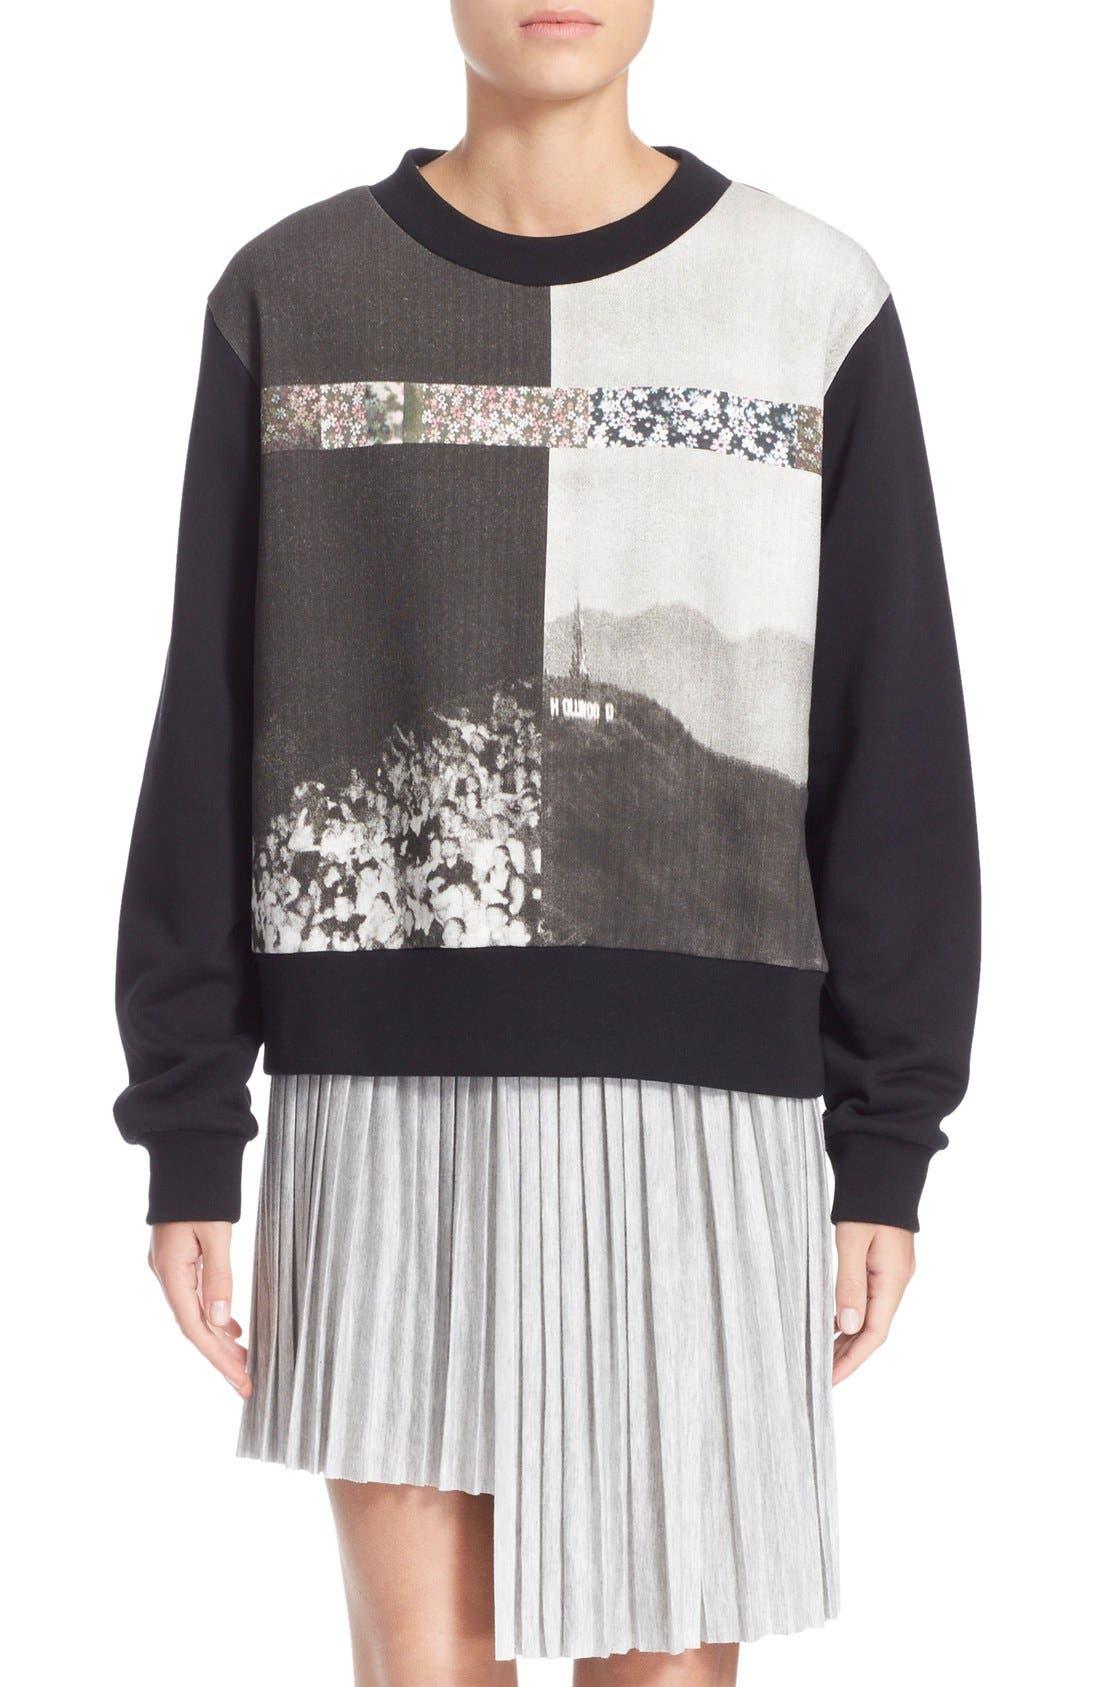 Alternate Image 1 Selected - MM6 Maison Margiela Photo Print Graphic Sweatshirt